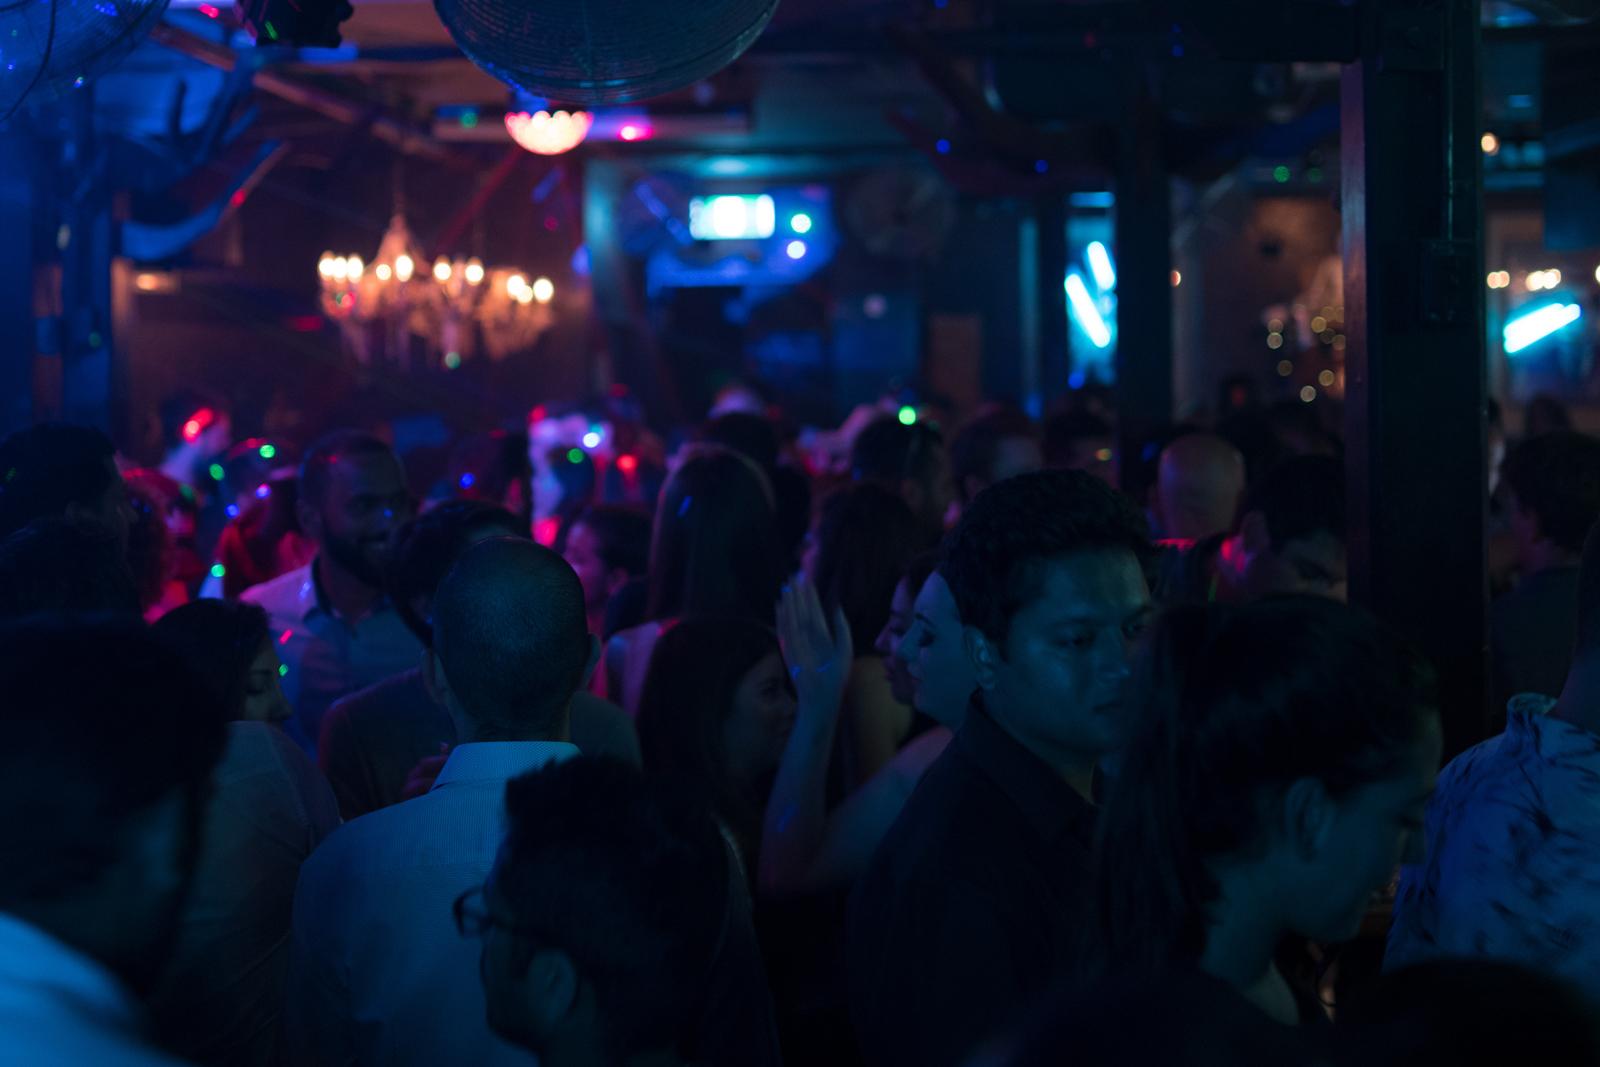 Mendoza Saturdays - Melbourne's Best Latin Nightclub.9pm-3amLadies Free before 11pm*$12 general | $10 guest listOn the decks Dj Chamo, Dj Chicho and guests. Salsa, Reggaeton, Bachata and Latin Funk.*{except special events}